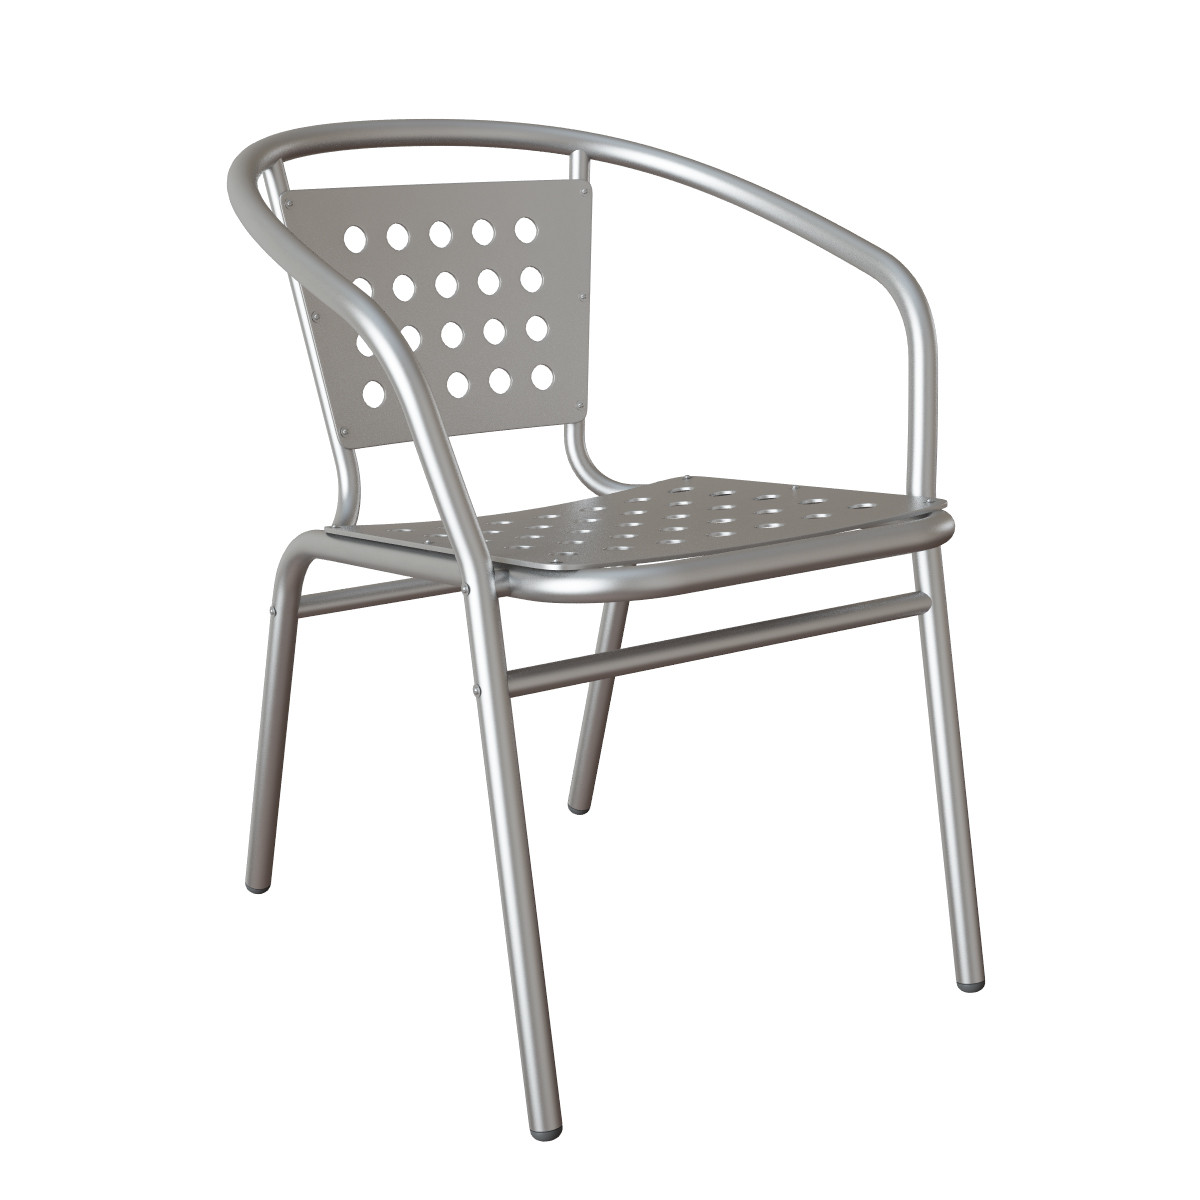 Outdoor Aluminium Arm Chair_01.jpg